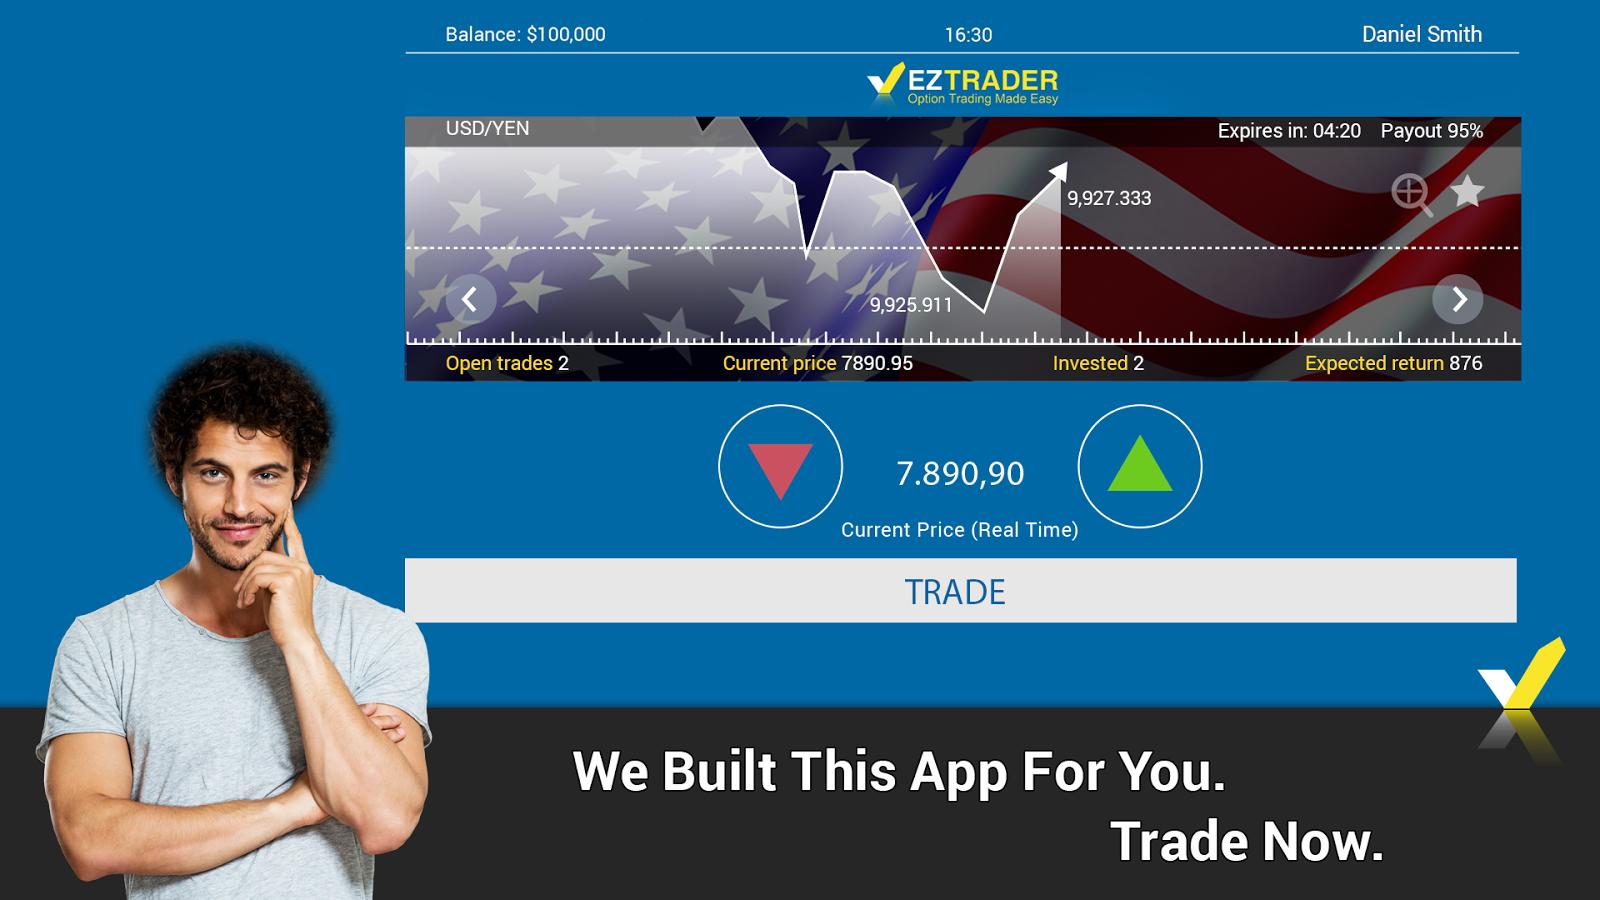 Eztrader option trading made easy